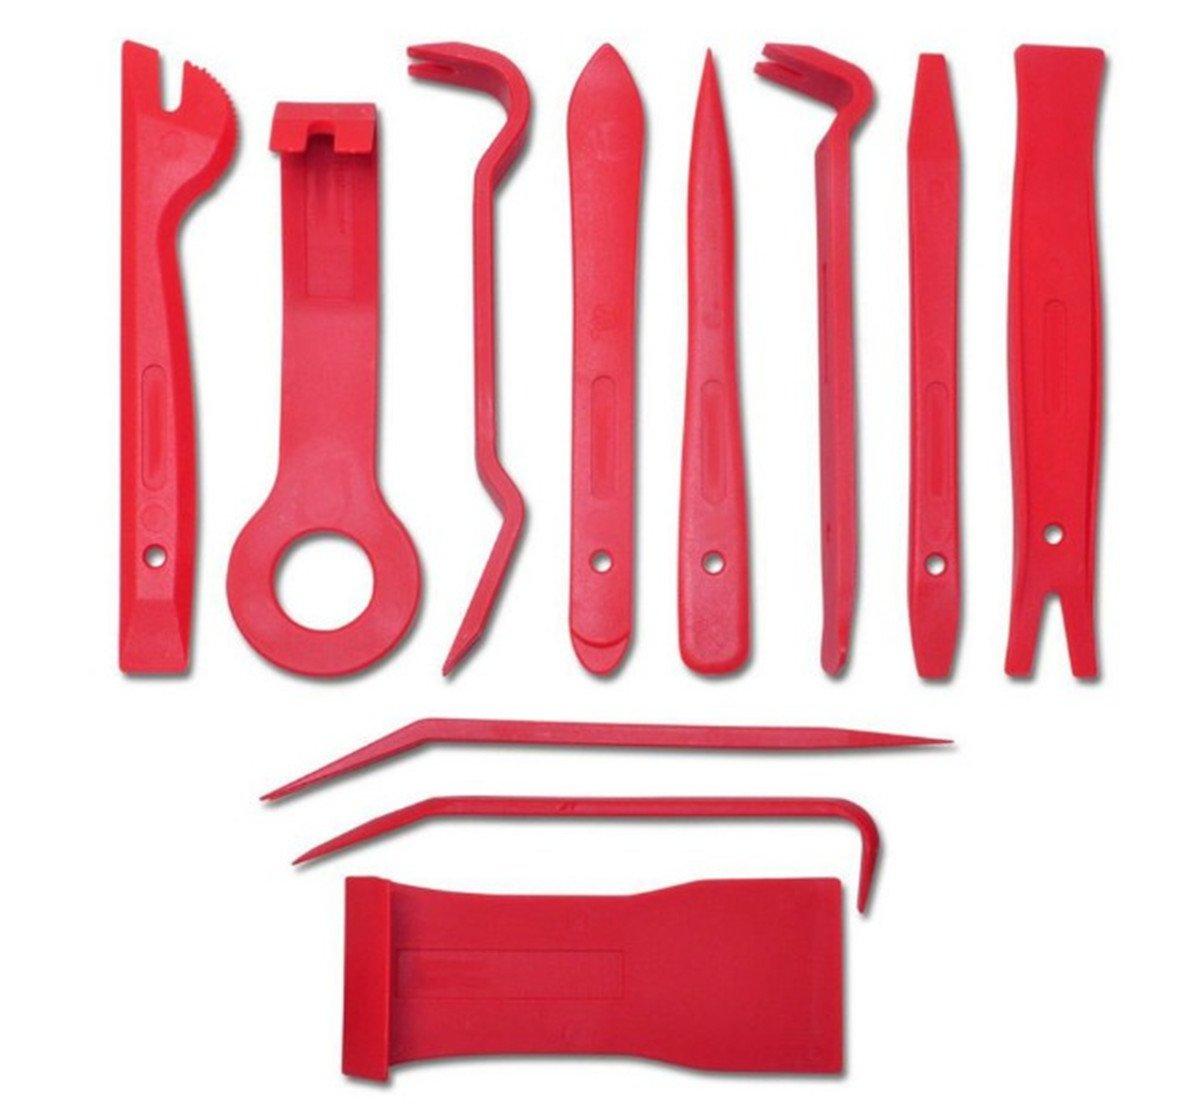 BININBOX 11Pcs Set Auto Door Clip Panel Trim Removal Tool Kits Window Molding Upholstery For Car Interior Dash Radio Audio Installer Pry (Plastic Bag)